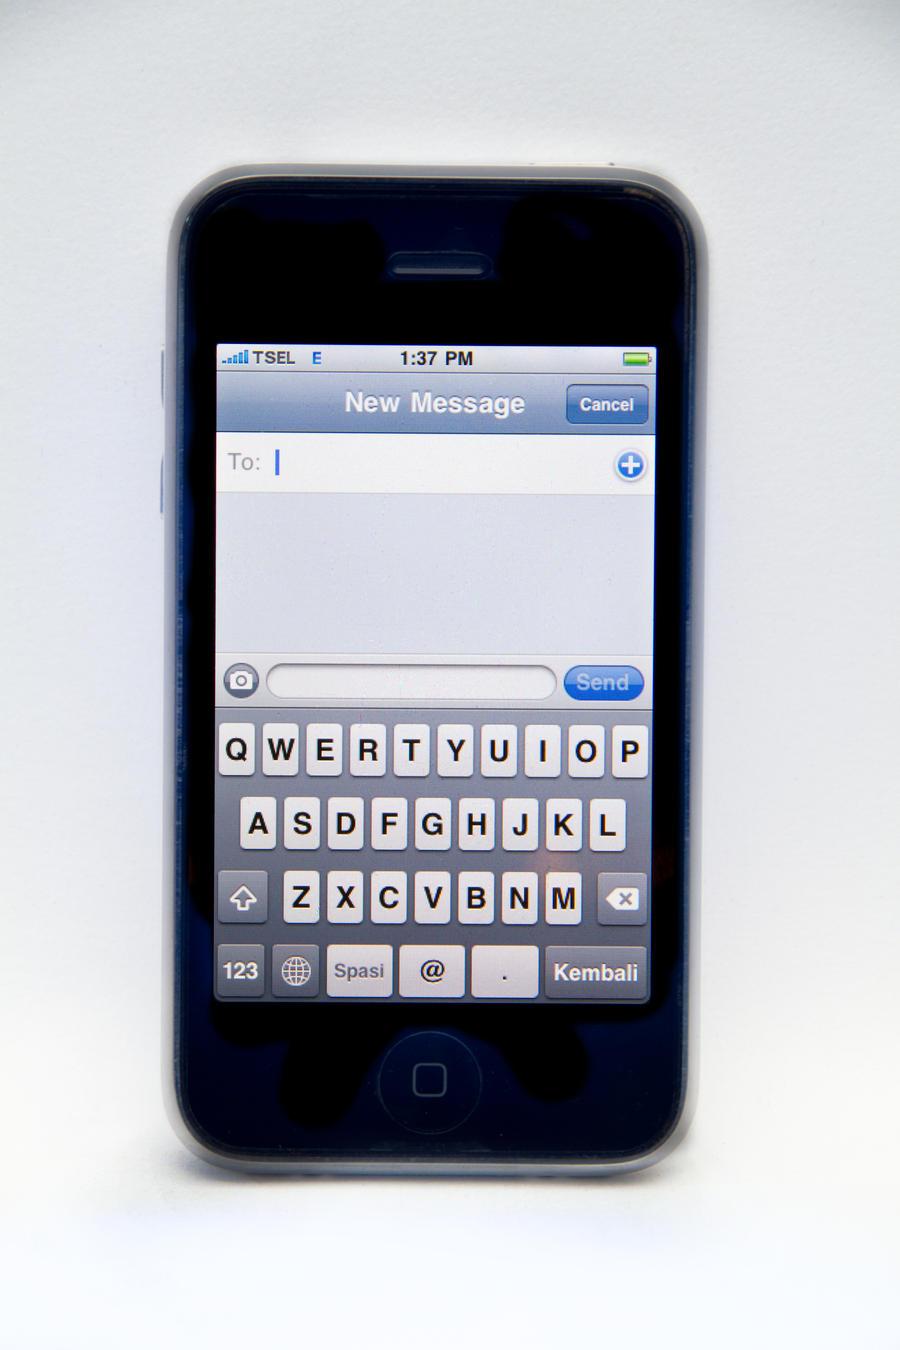 how to change to croatia keyboard on iphone